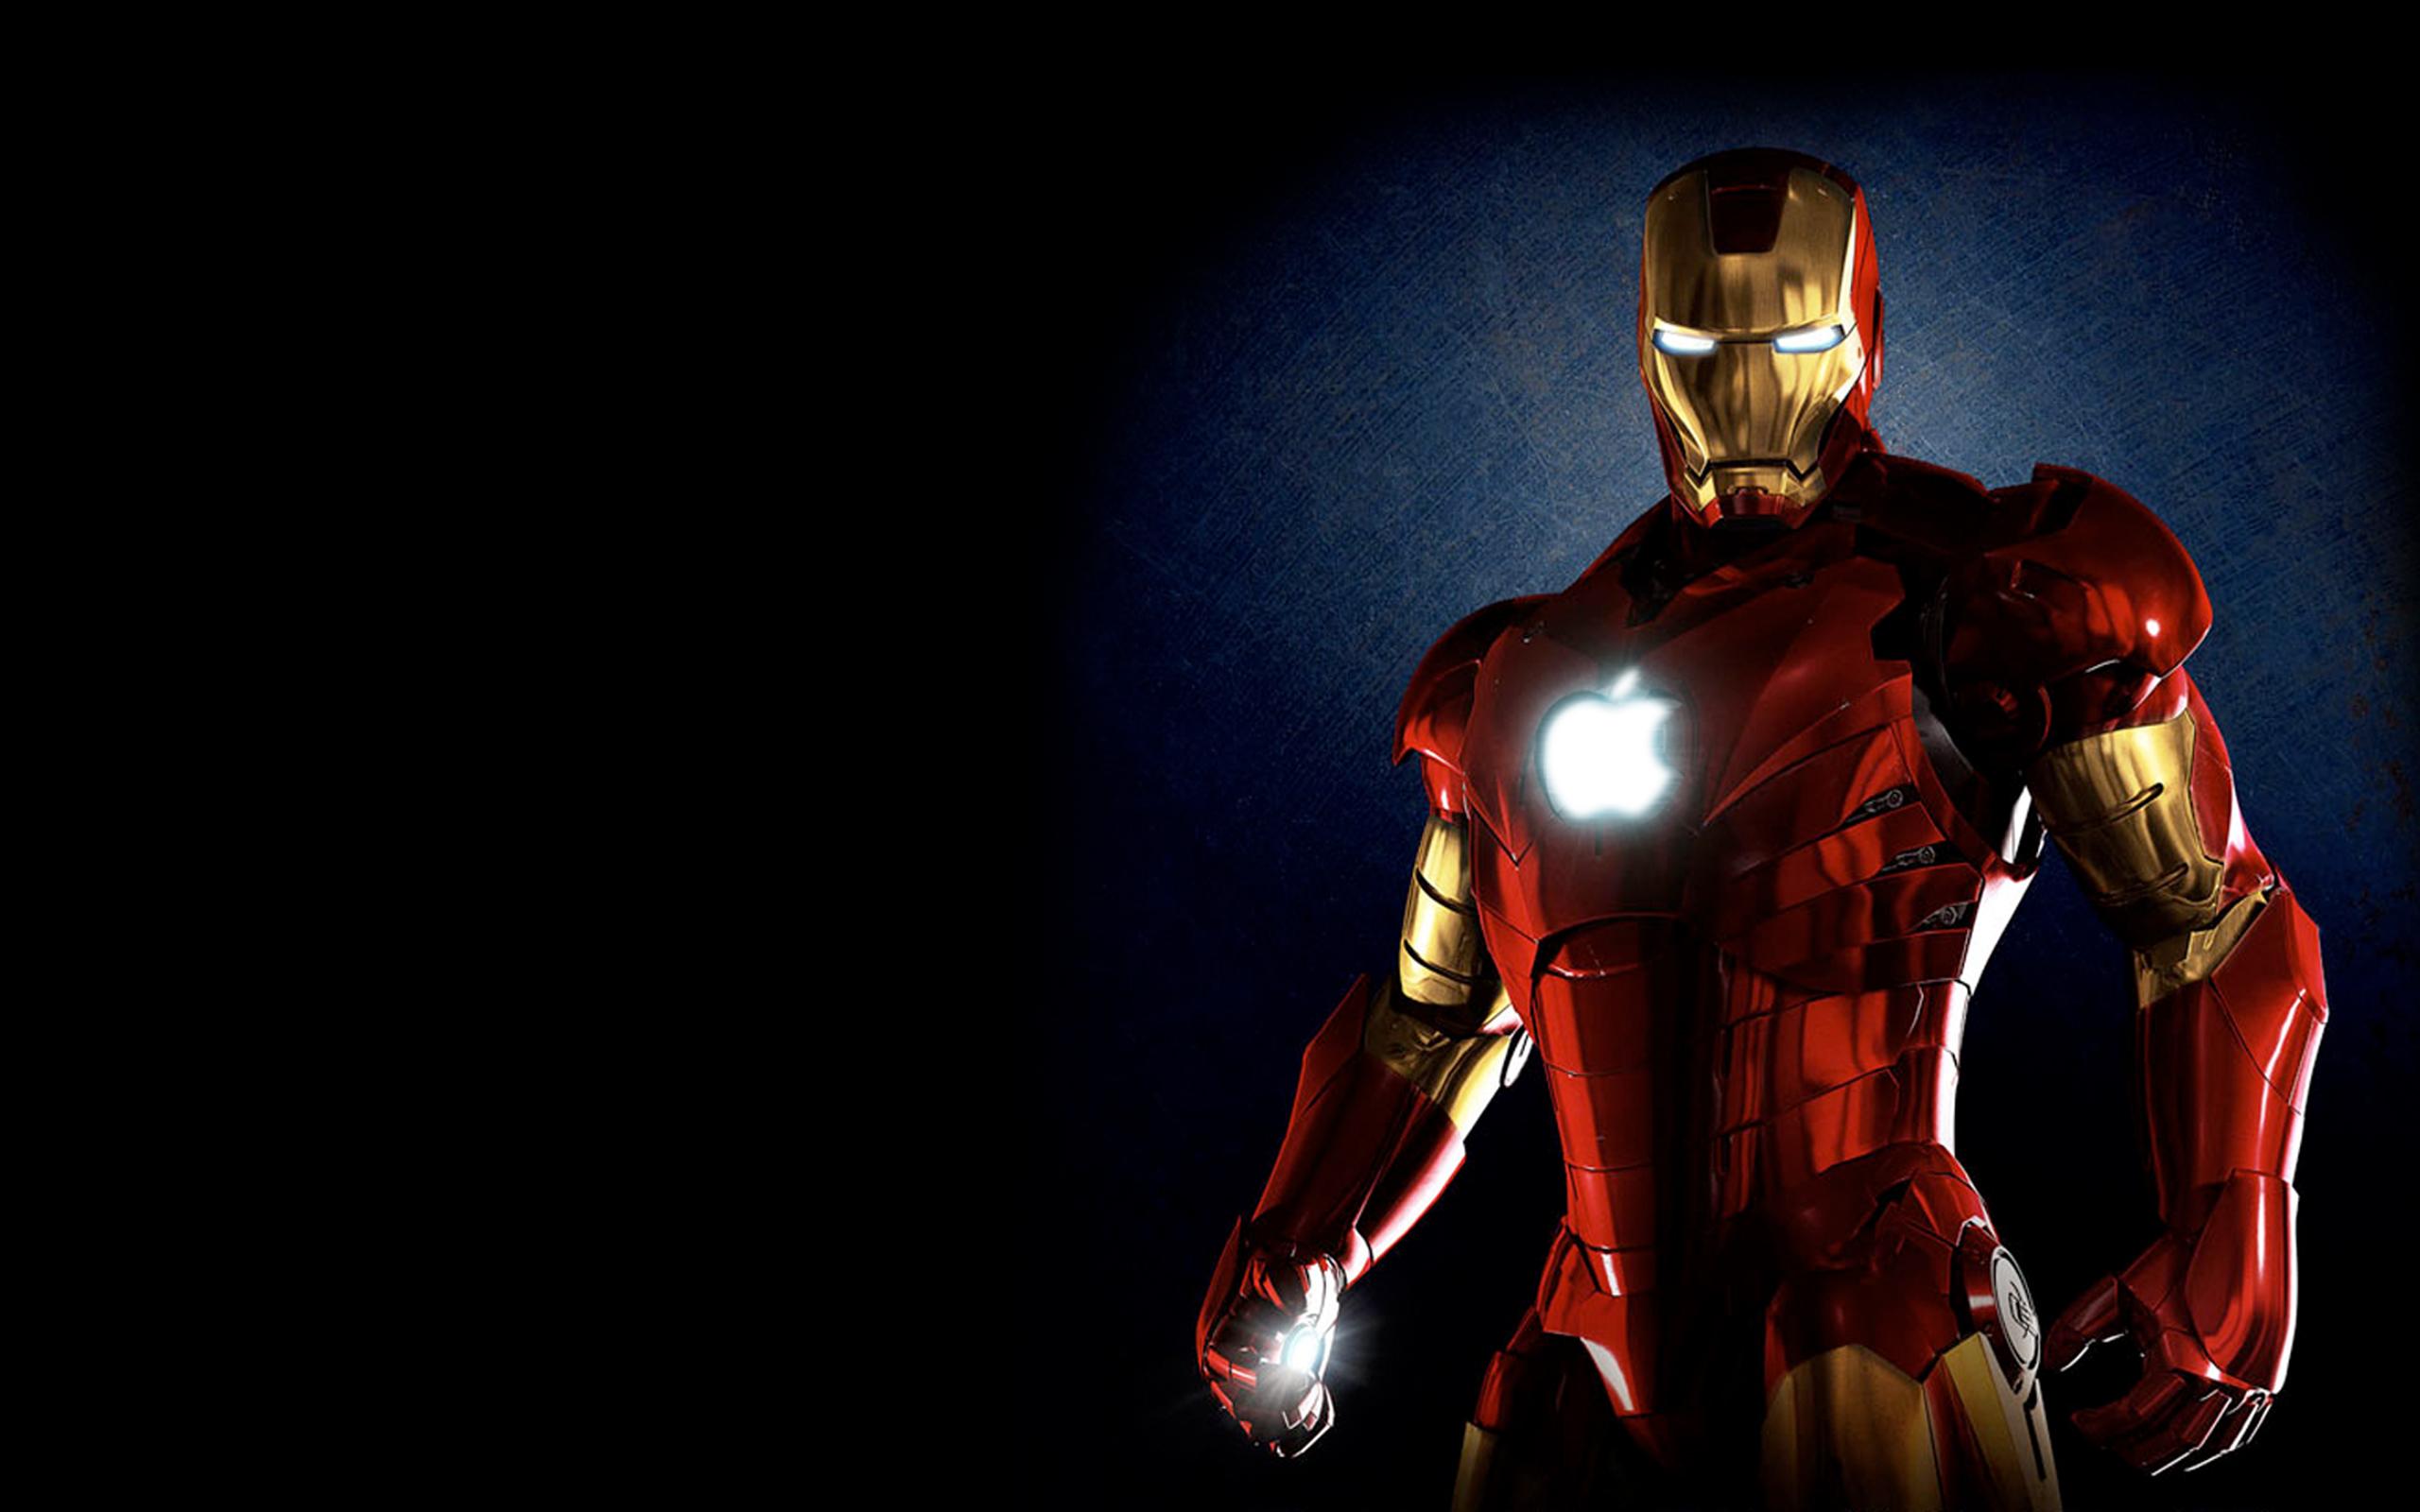 Cool Iron Man Wallpaper  WallpaperSafari